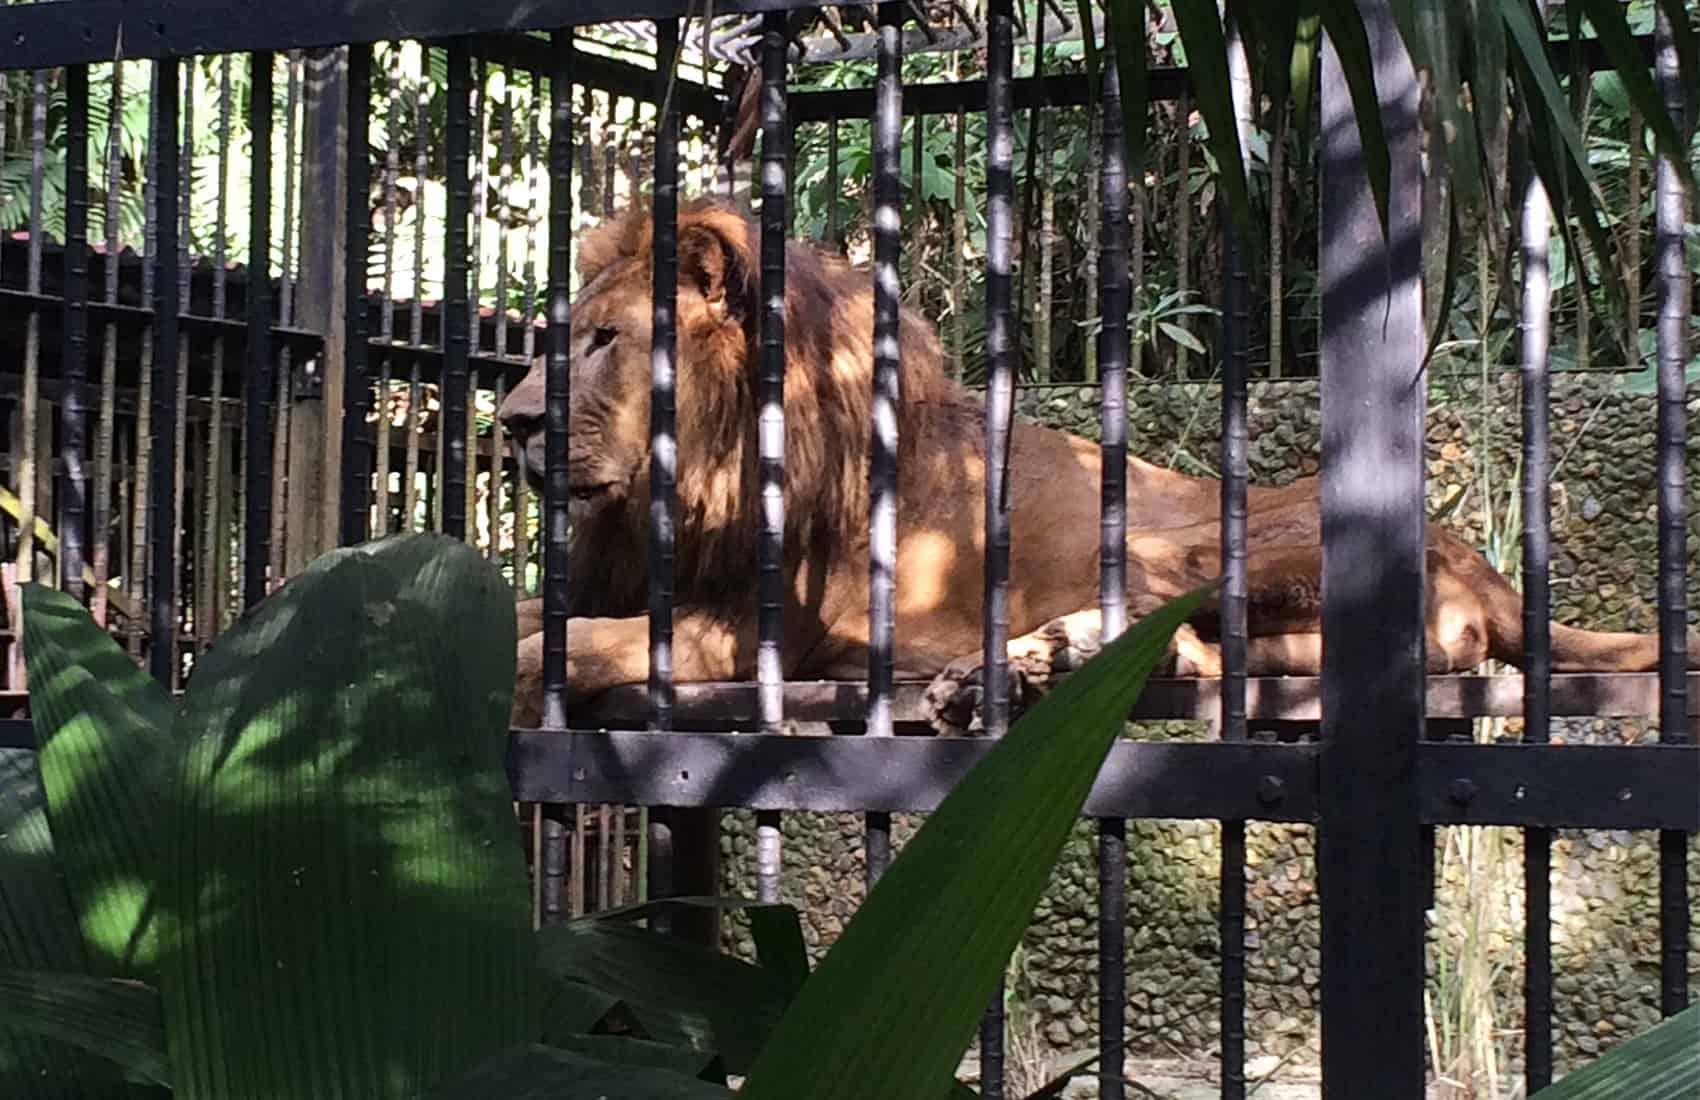 Kivú the lion. Simón Bolívar Zoo, San José. Nov. 7 2016.